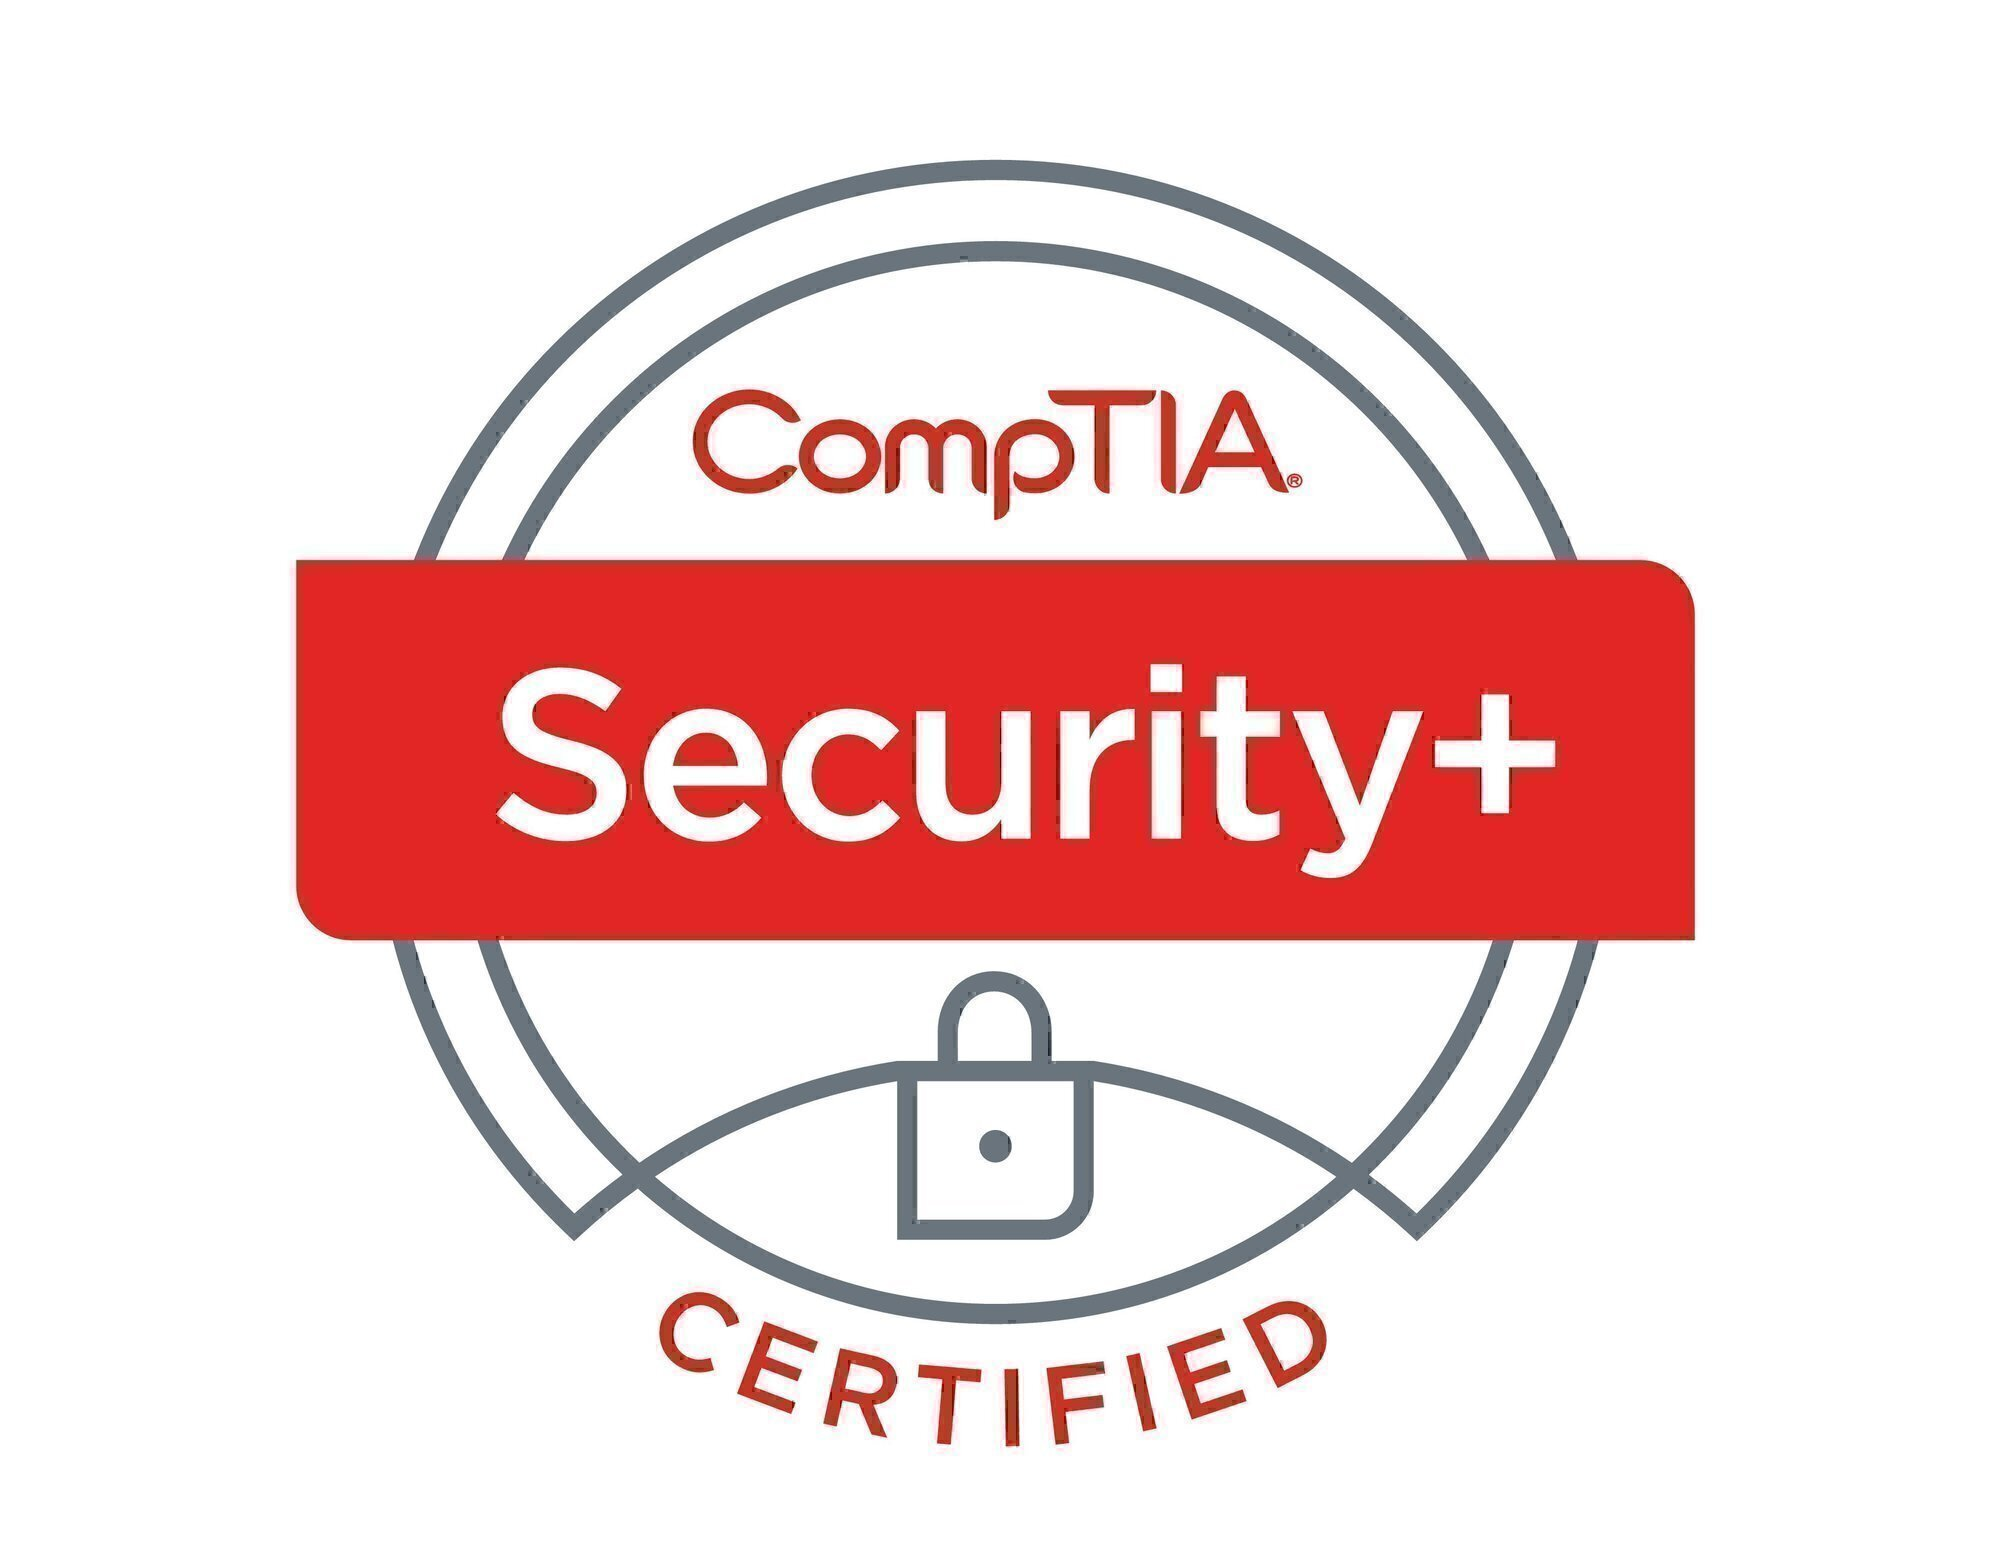 college security certified comptia career carolina certification military